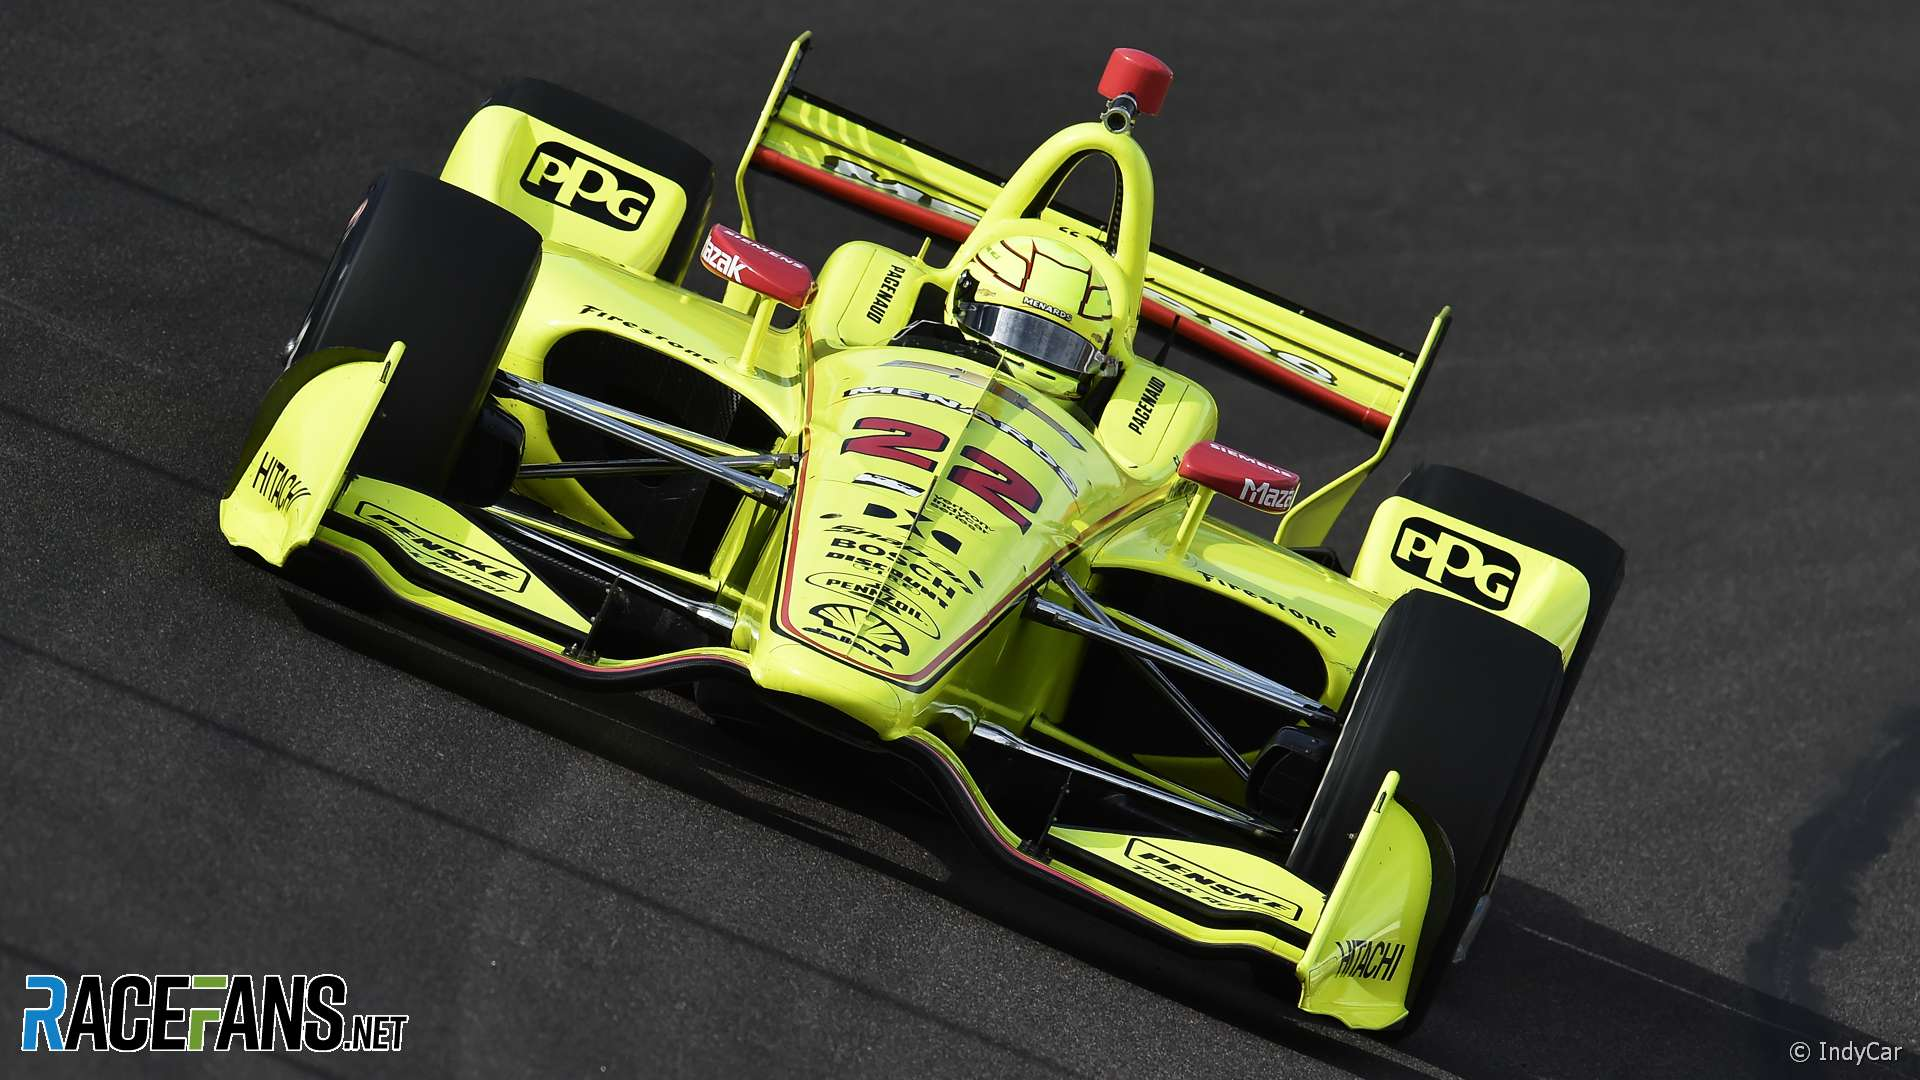 Simon Pagenaud, Penske, IndyCar, 2018